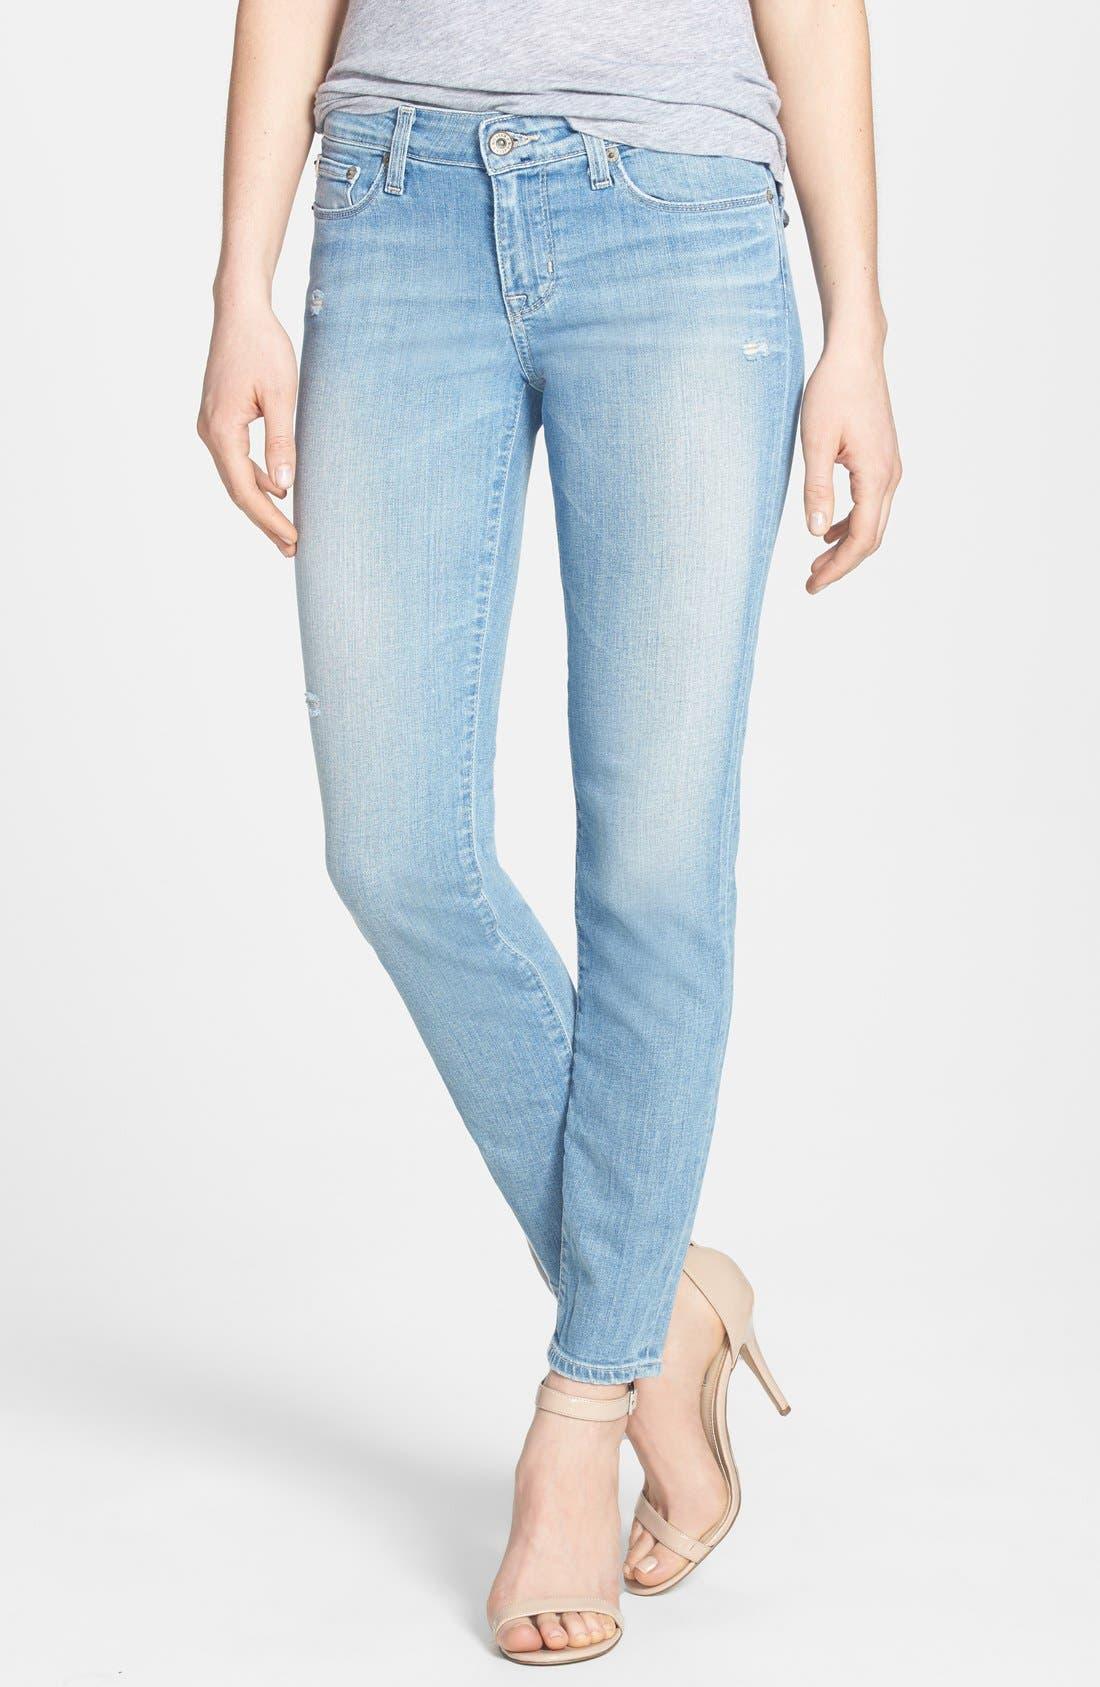 Alternate Image 1 Selected - Big Star 'Alex' Distressed Stretch Skinny Jeans (20-Year Harbor) (Petite)